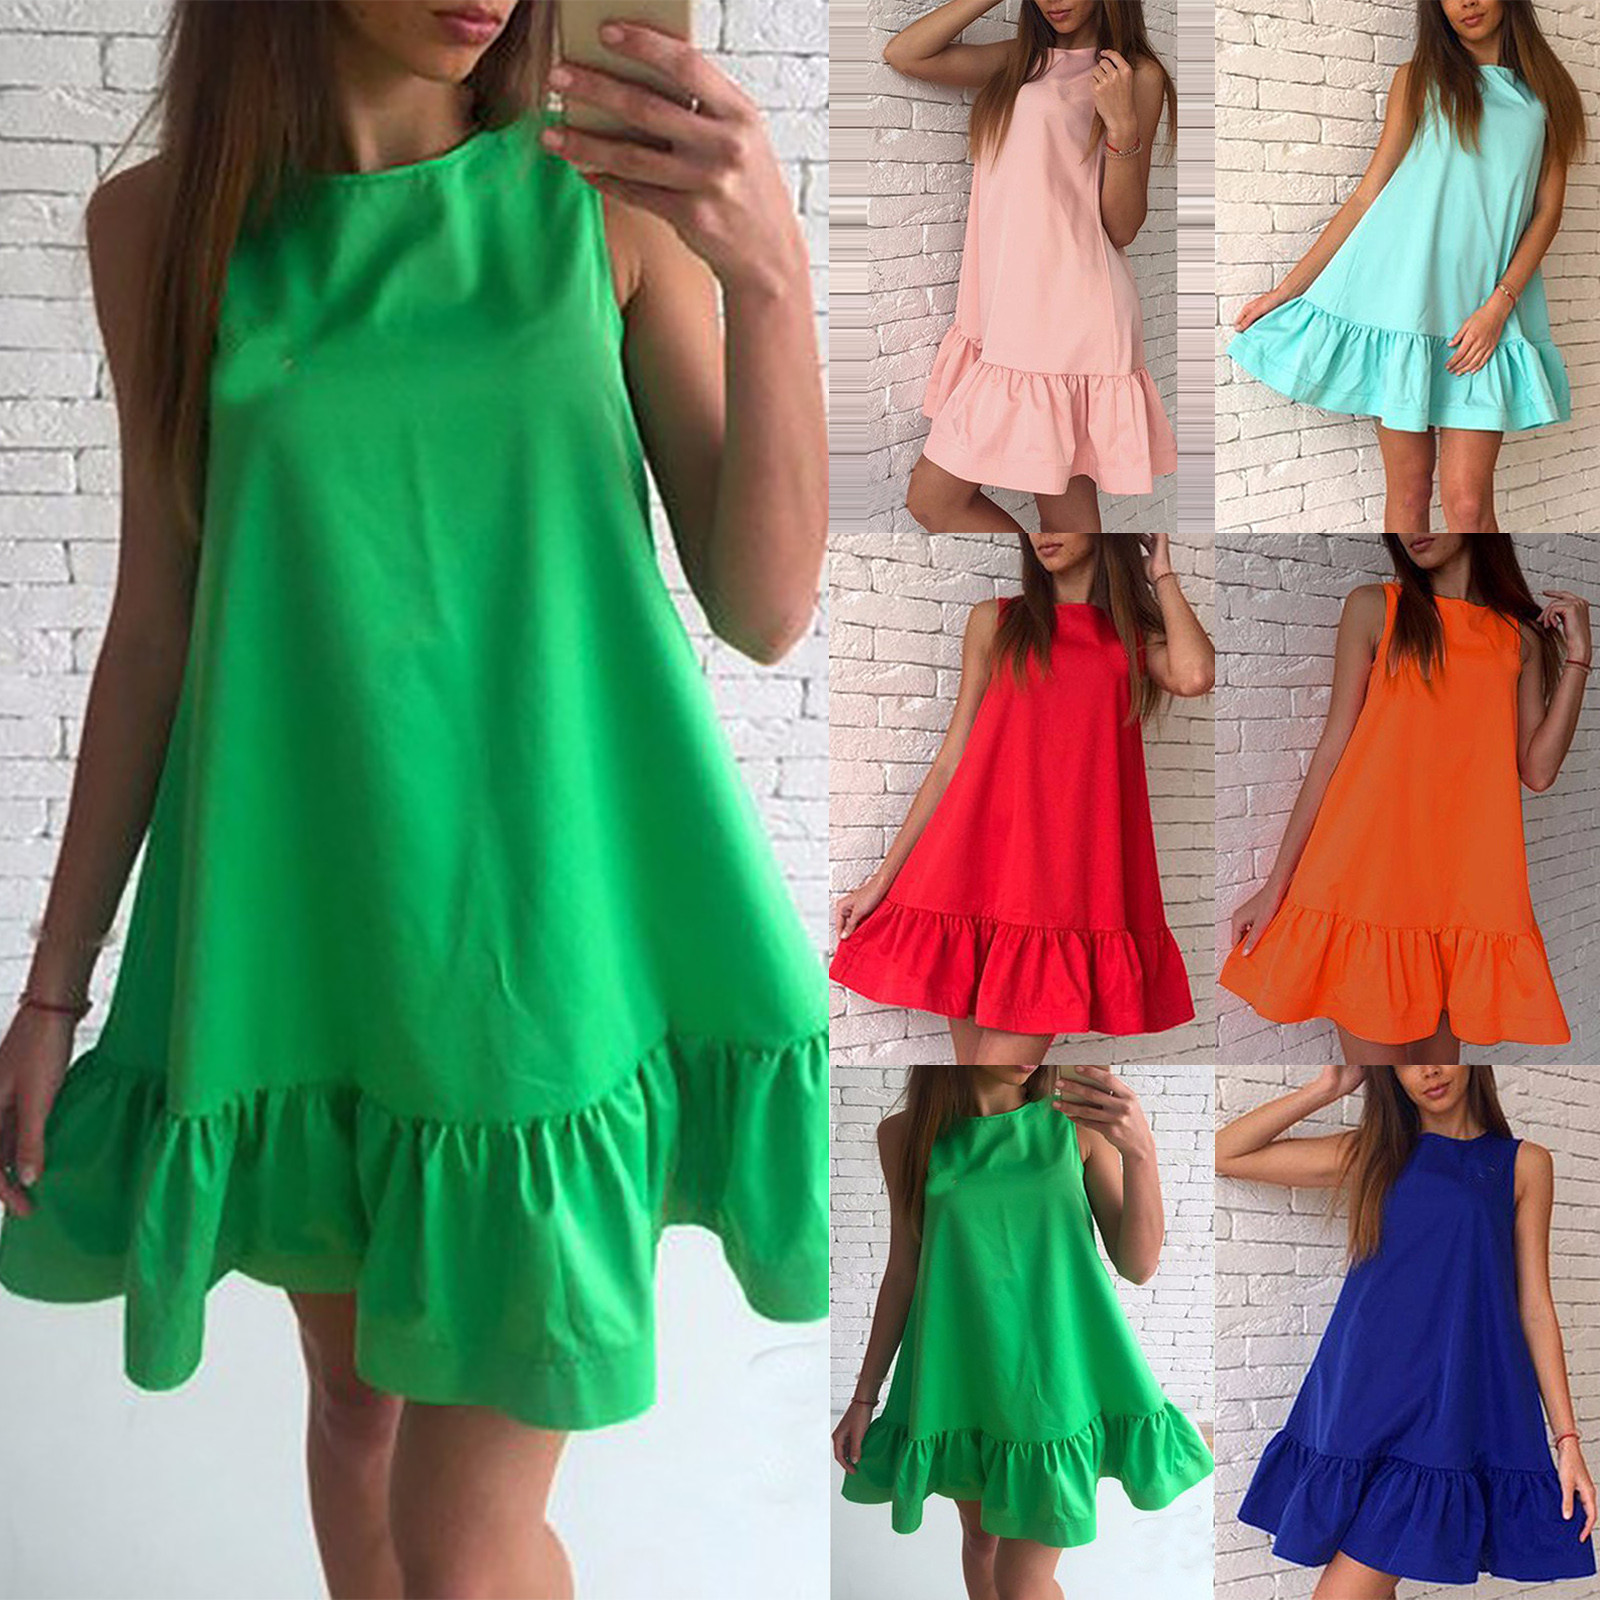 Vintage Oversized Woman Dress Casual O neck Solid Color Vest Sleeveless Soft Pleated Dress Elegant Bohe Sleeveless Dresses